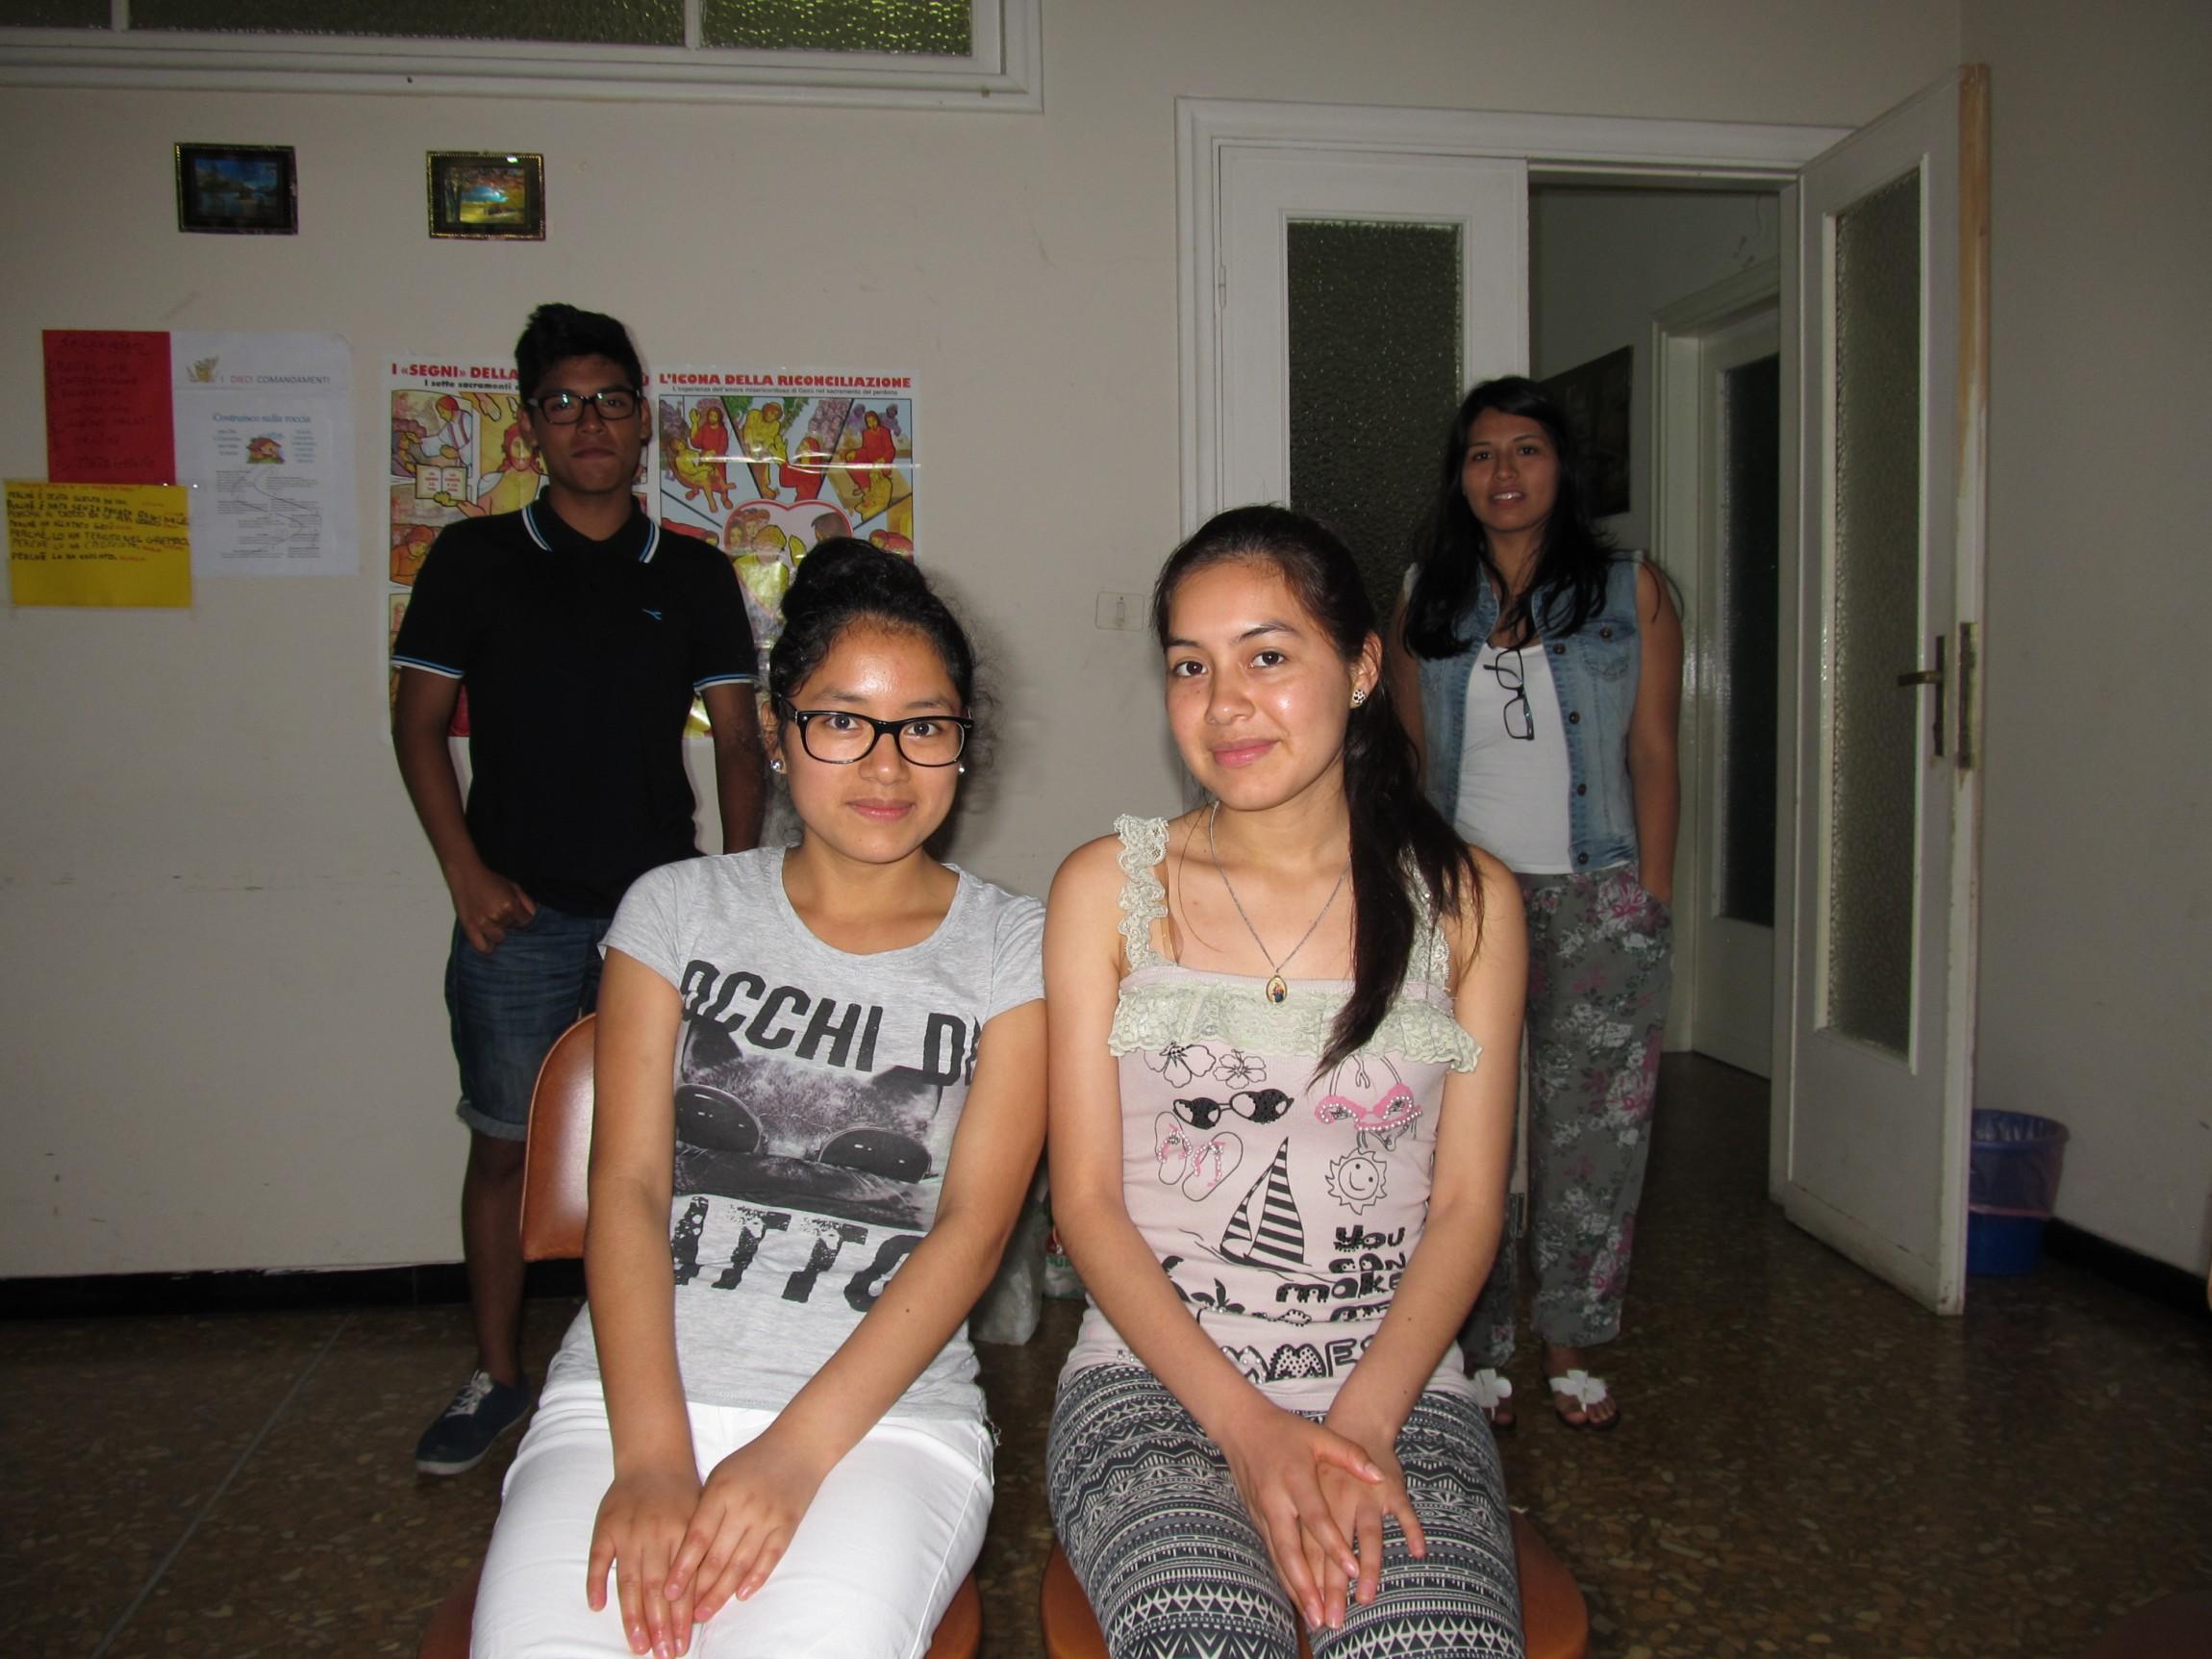 gruppo_giovani_2014-06-21-22-58-49